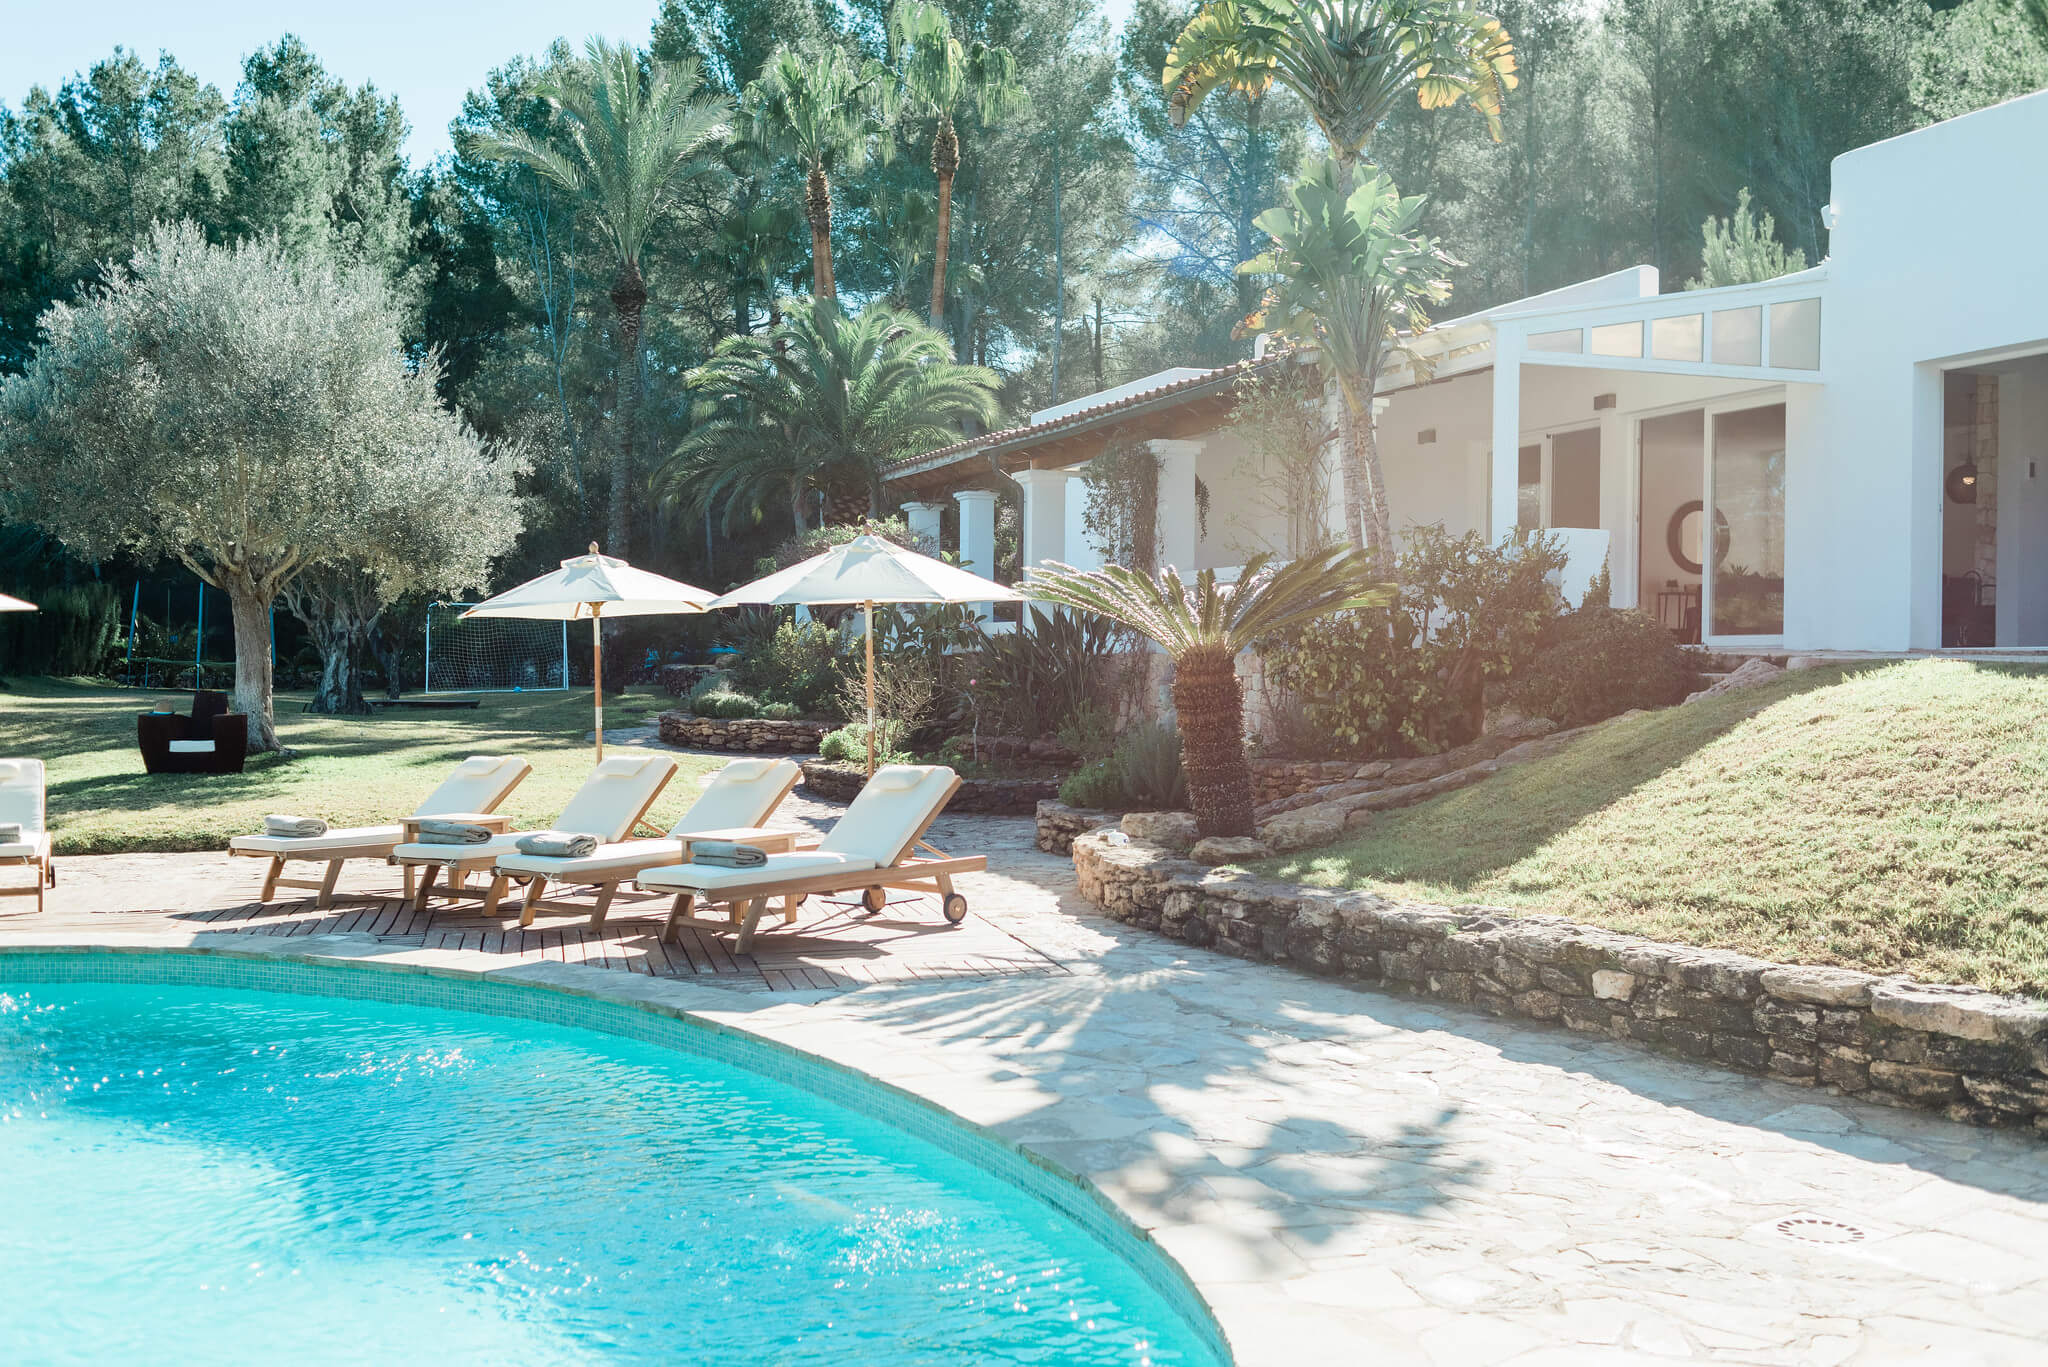 https://www.white-ibiza.com/wp-content/uploads/2020/05/white-ibiza-villas-can-verde-exterior-view-to-house.jpg